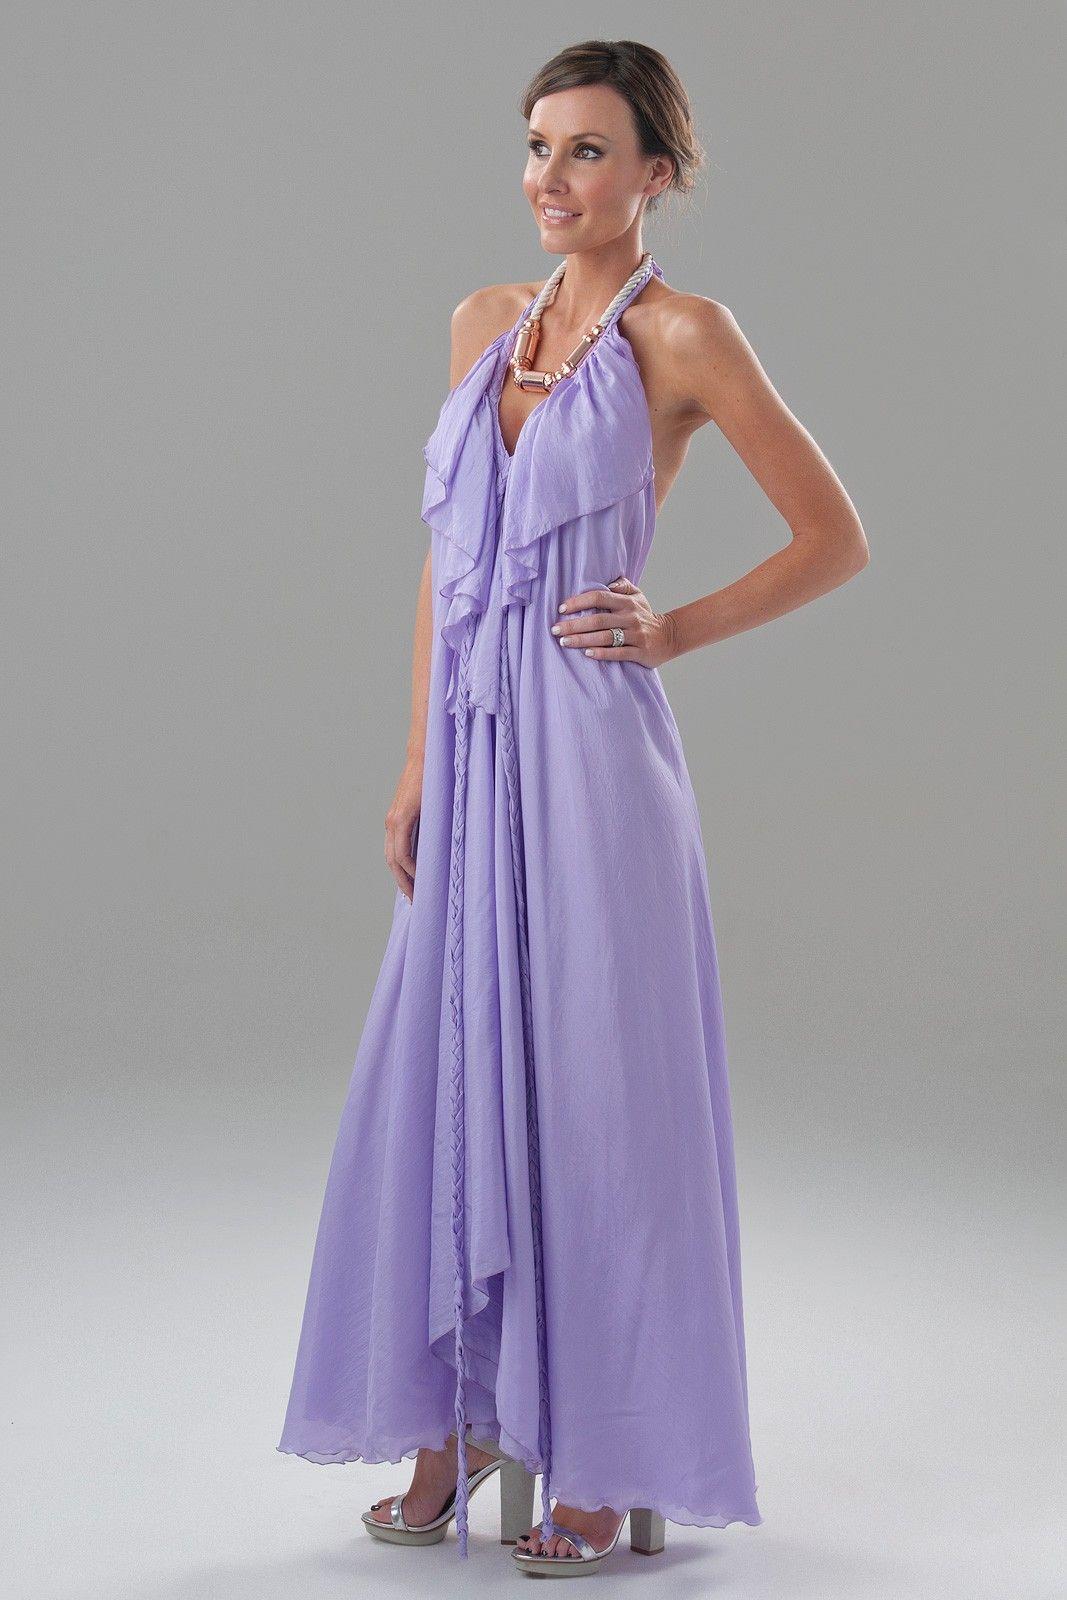 lisa brown lilac poppy v frill dress - Google Search | Bridesmaids ...